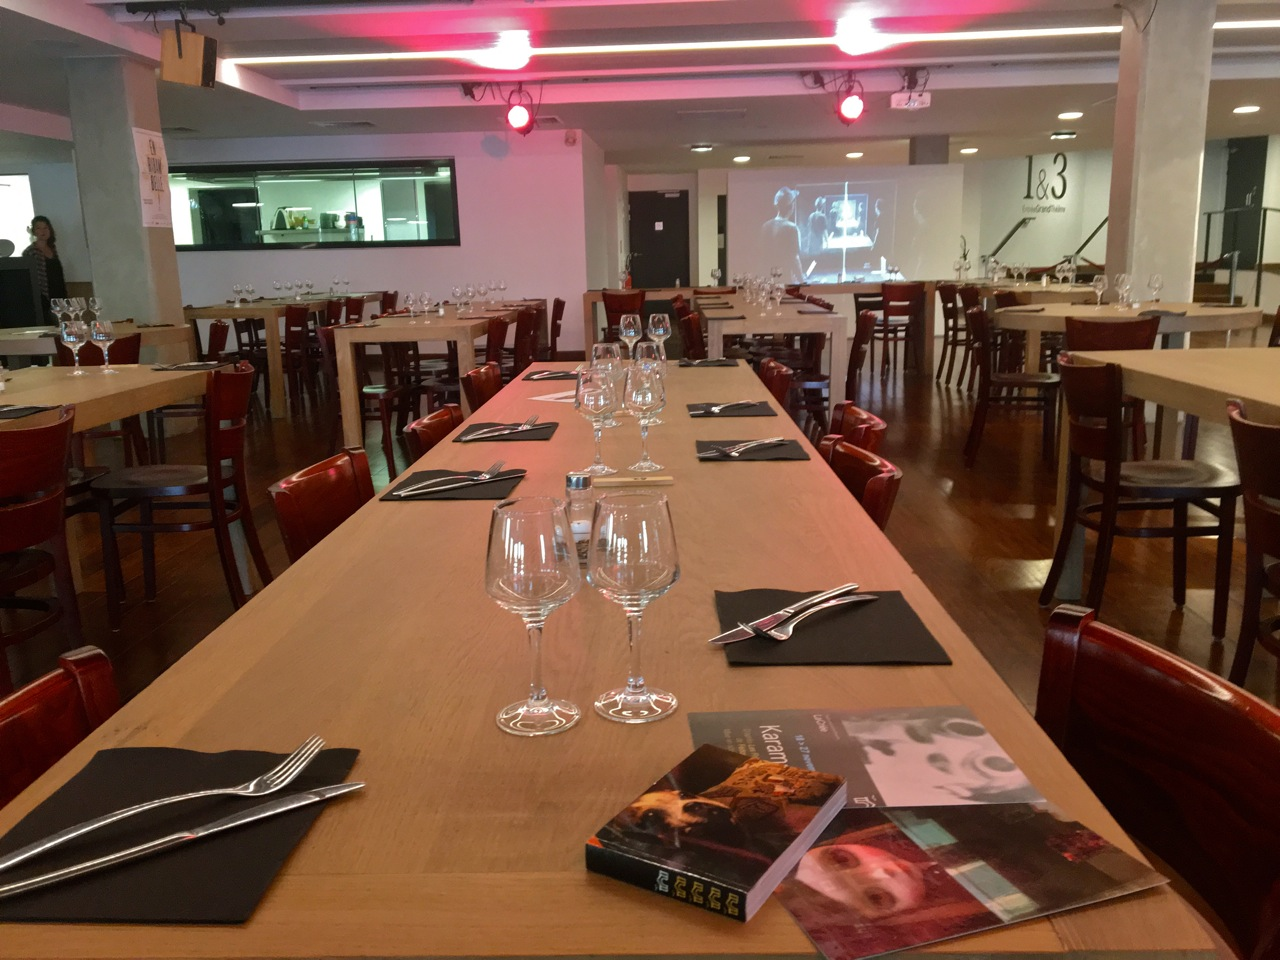 Restaurant vieux port les grandes tables de la cri e - Restaurant vieux port marseille routard ...